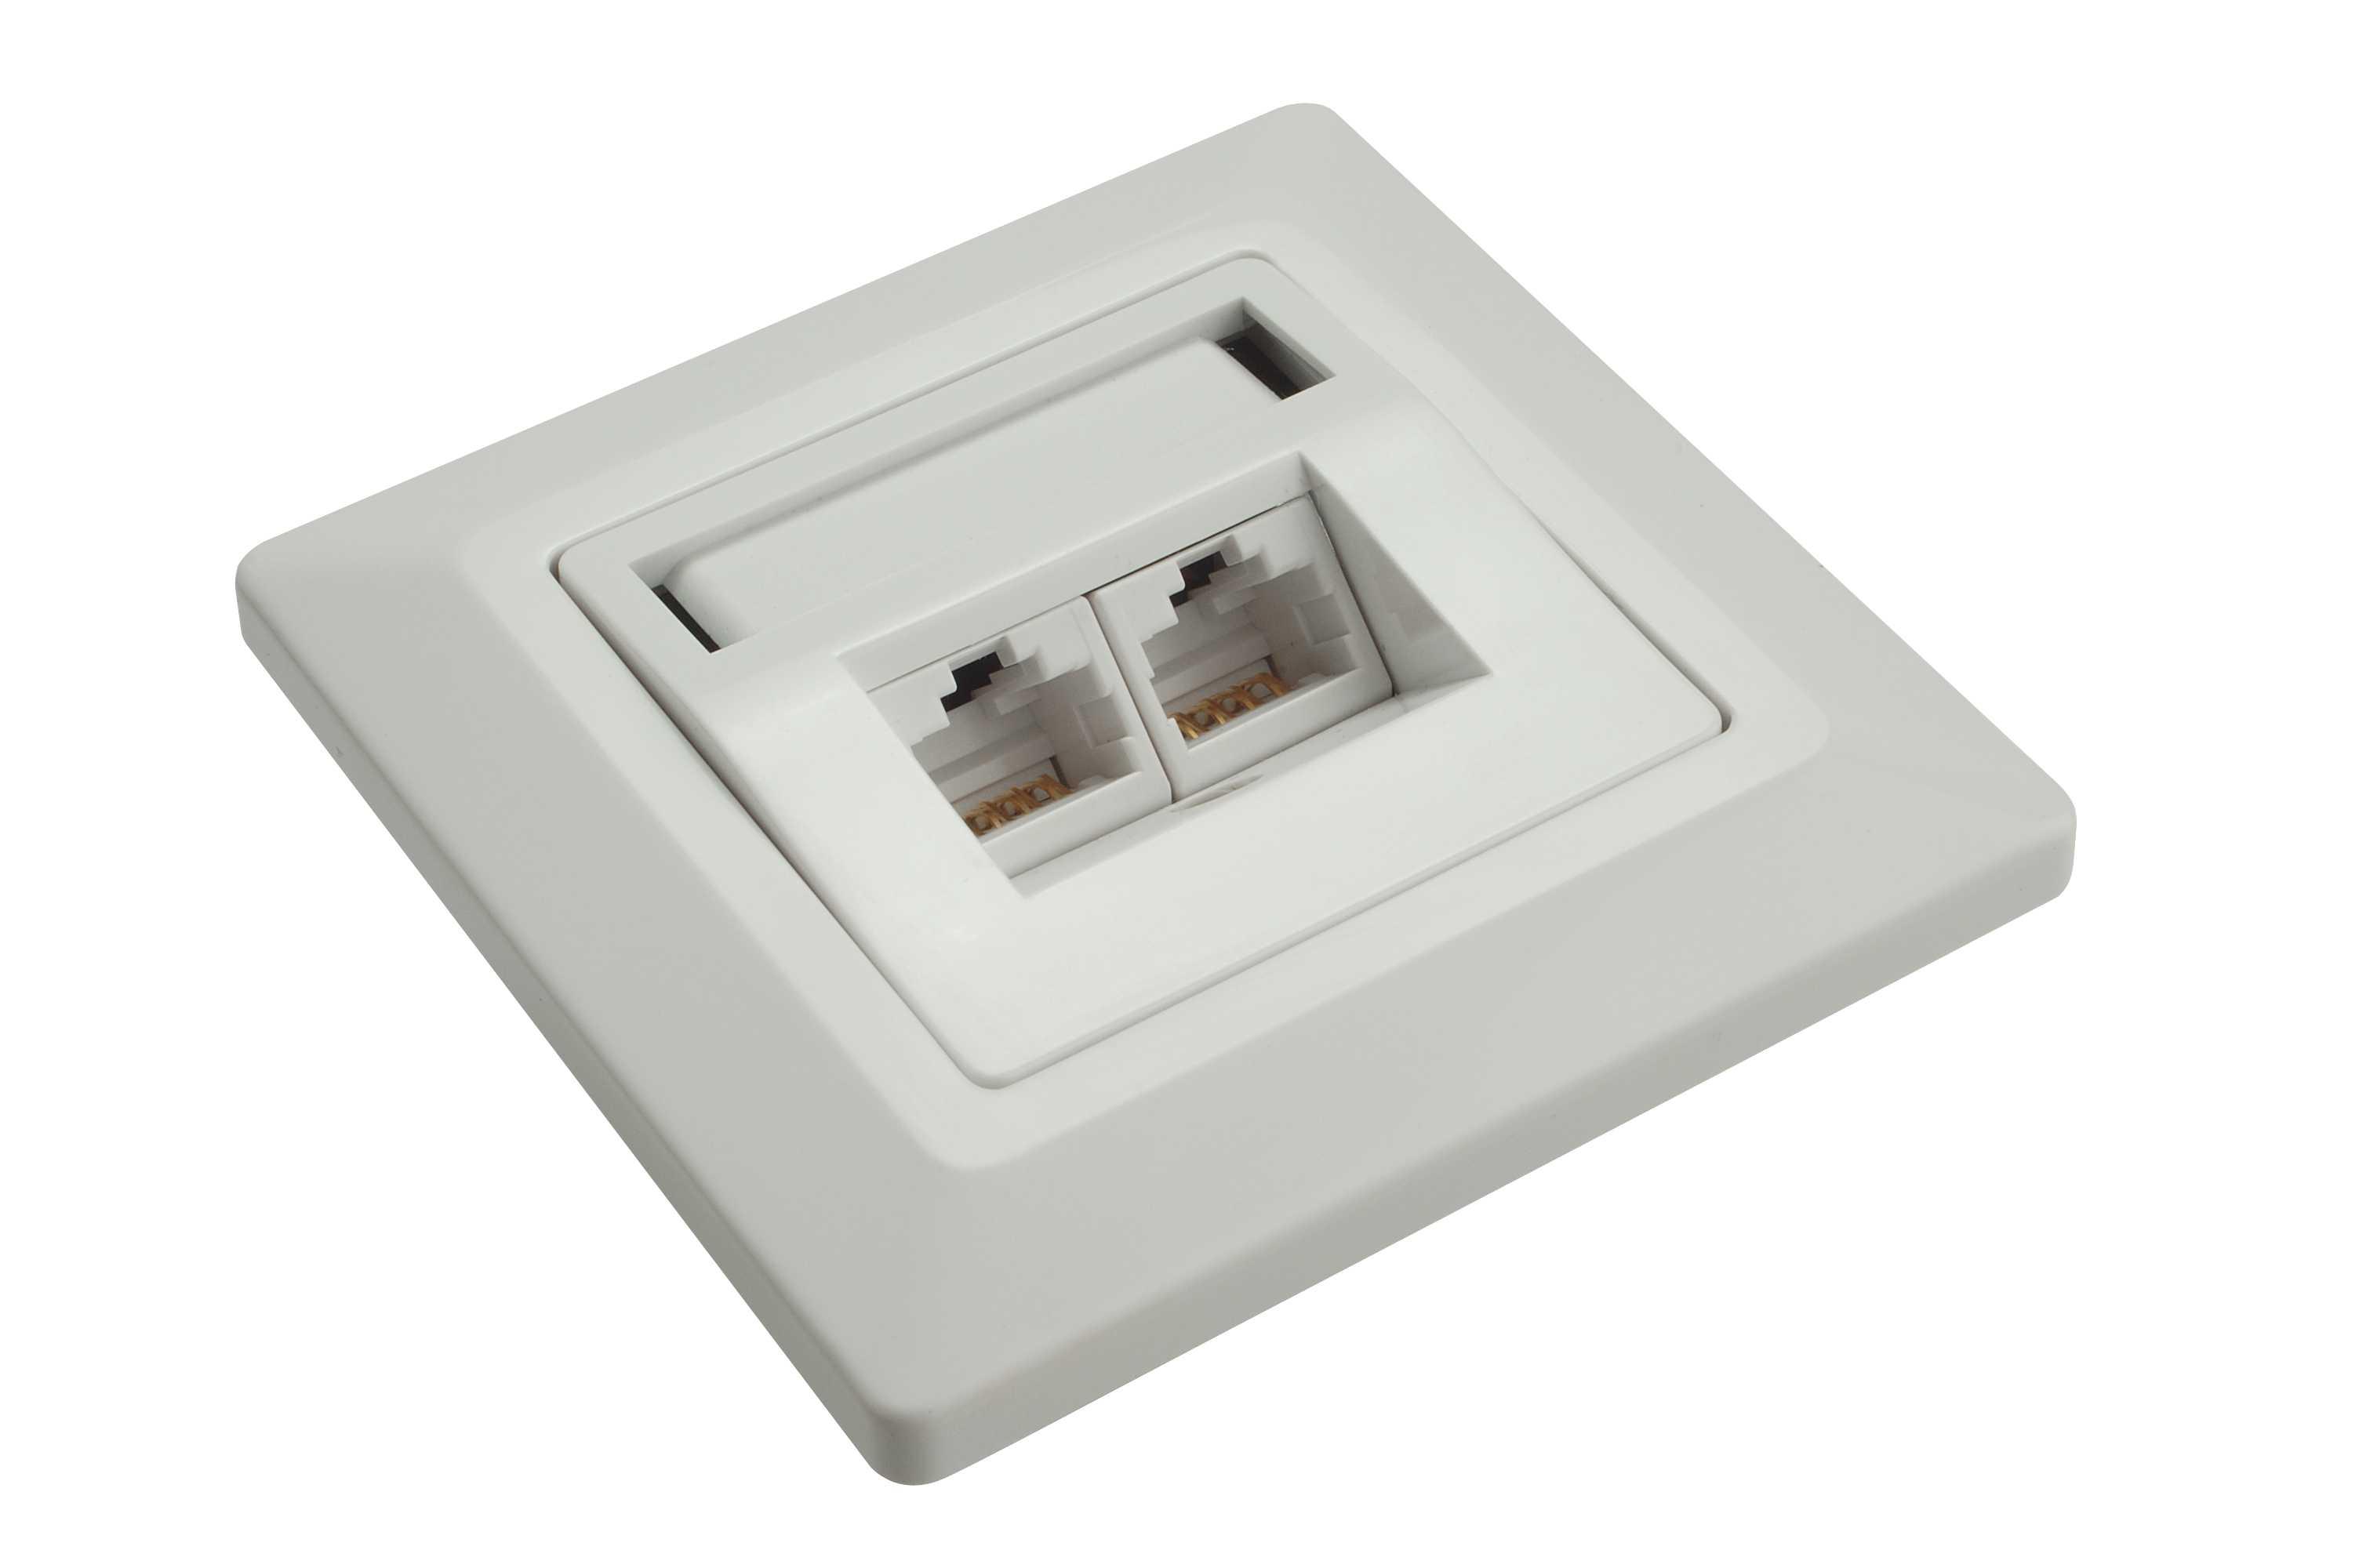 Zásuvka Solarix CAT5E UTP 2 x RJ45 pod omítku bílá